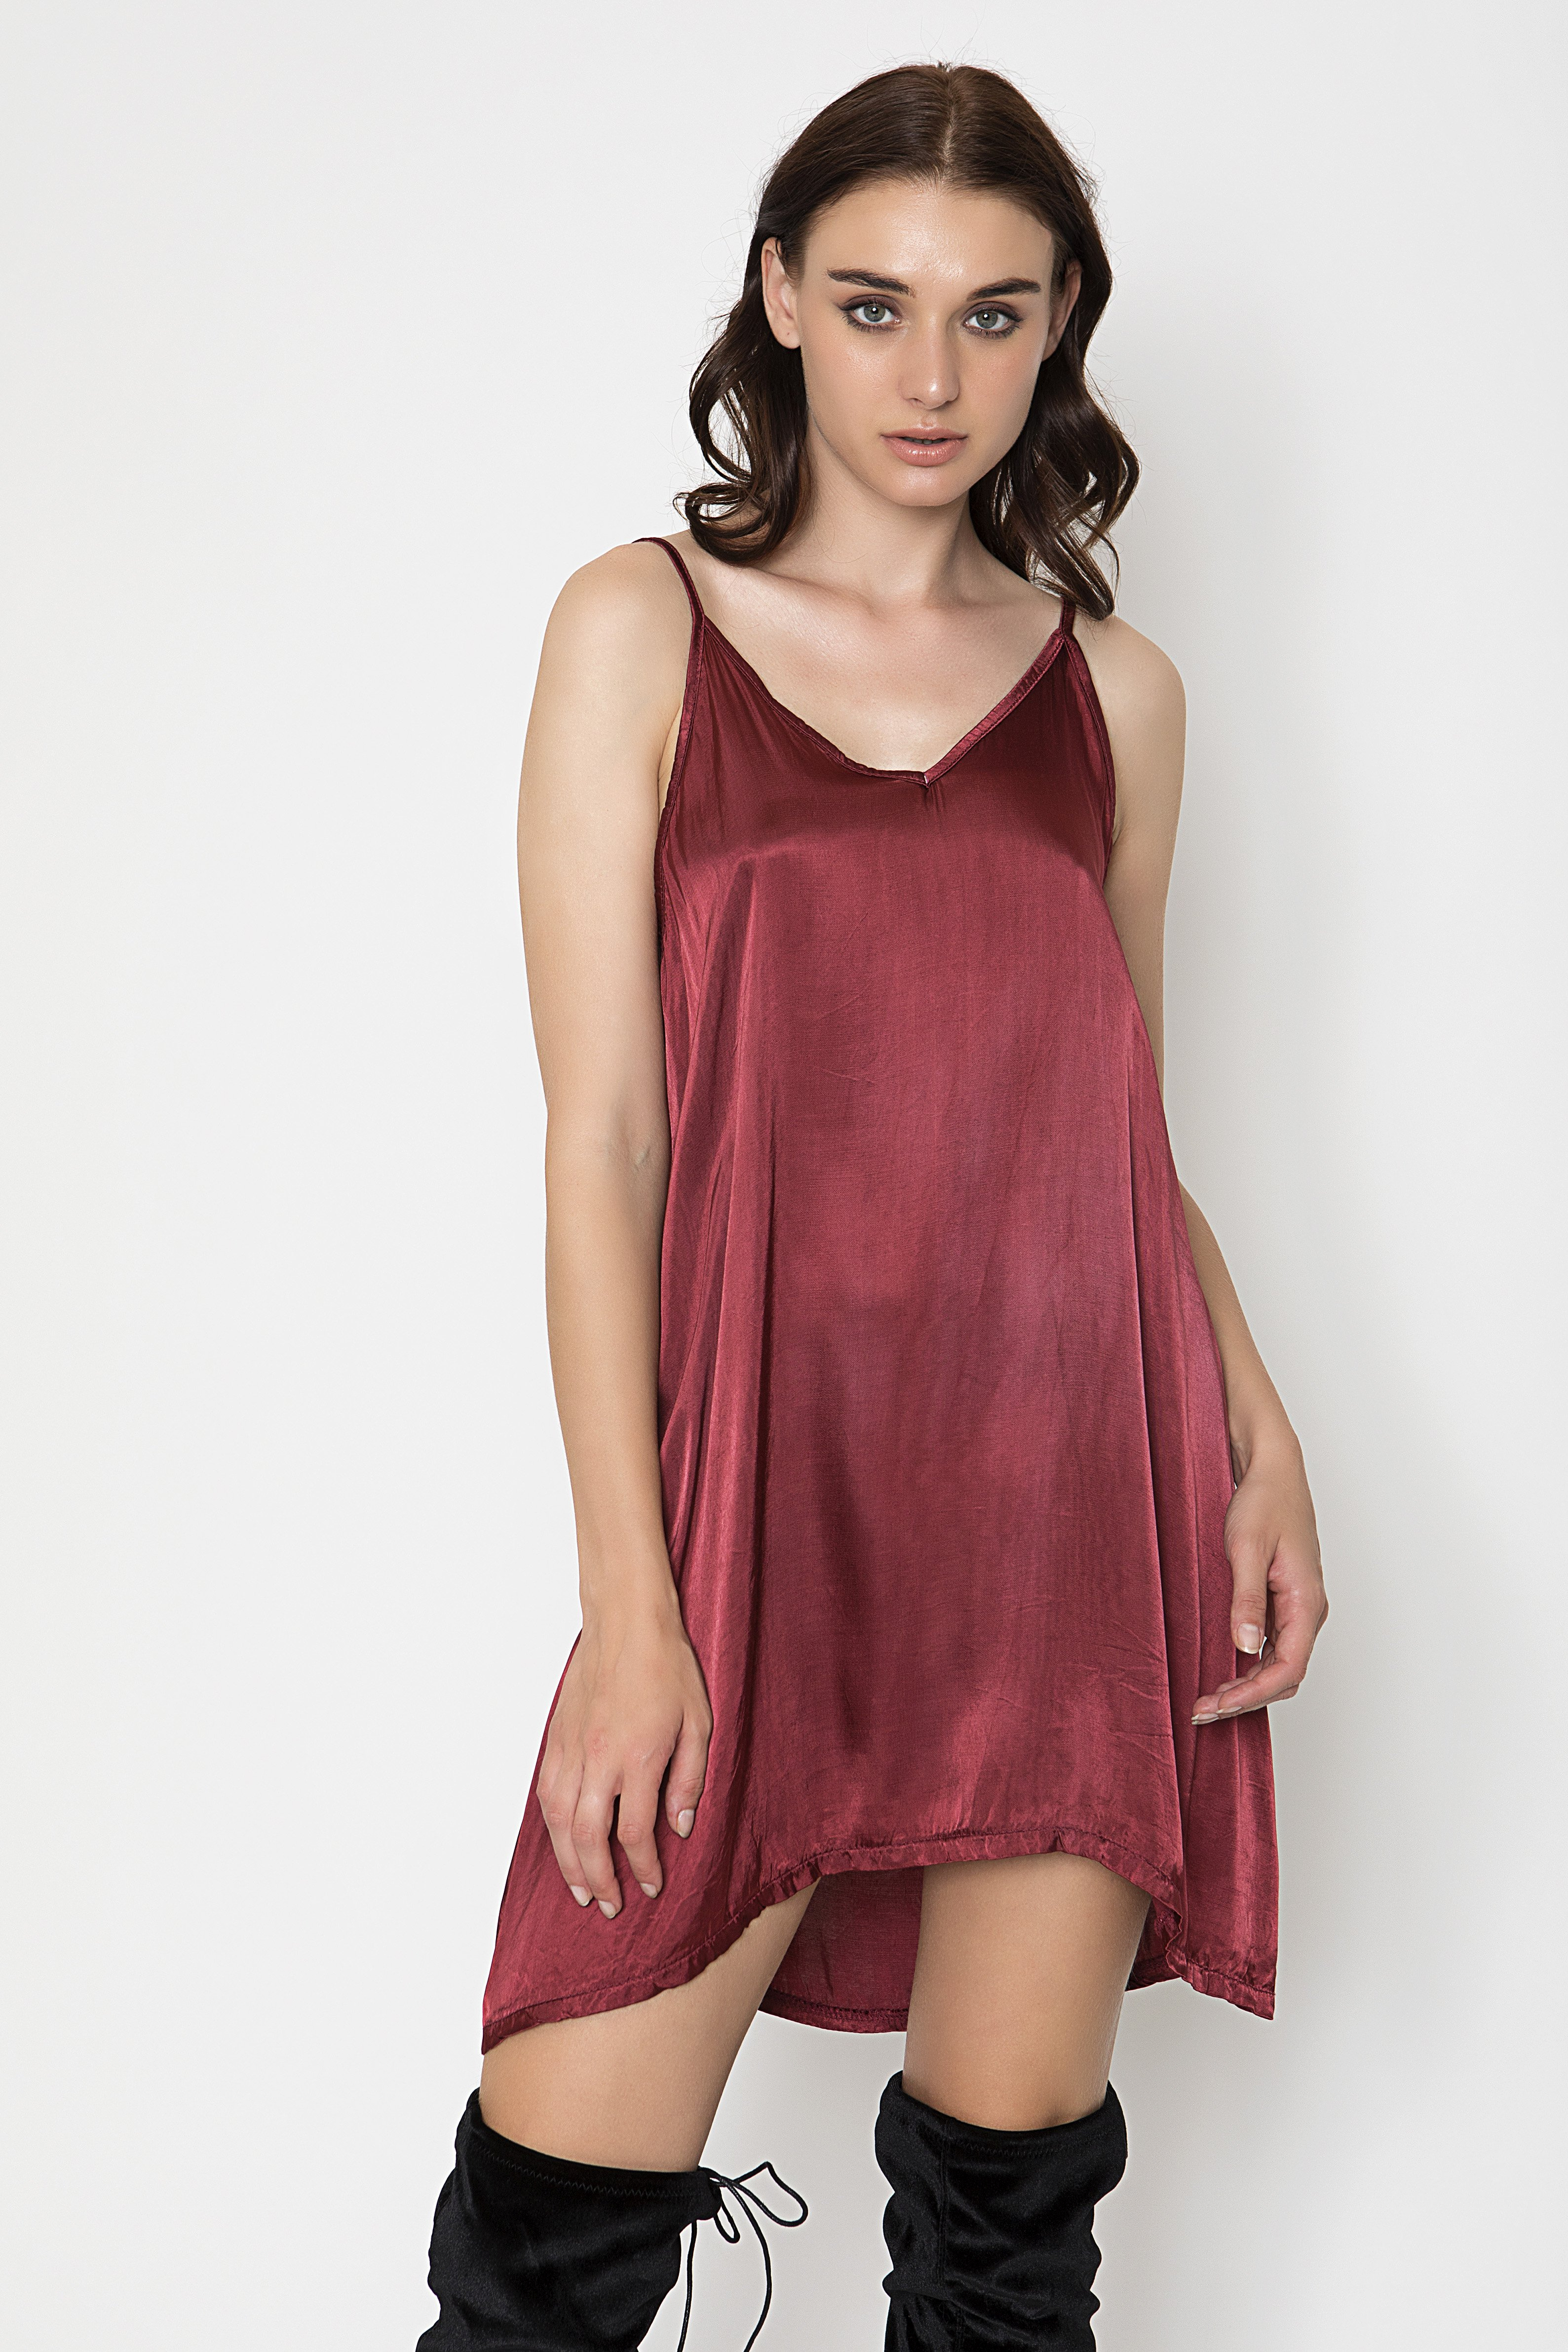 SATIN SLIP ΦΟΡΕΜΑ - Μπορντώ clothes   φορέματα   φόρμες   mini φορέματα